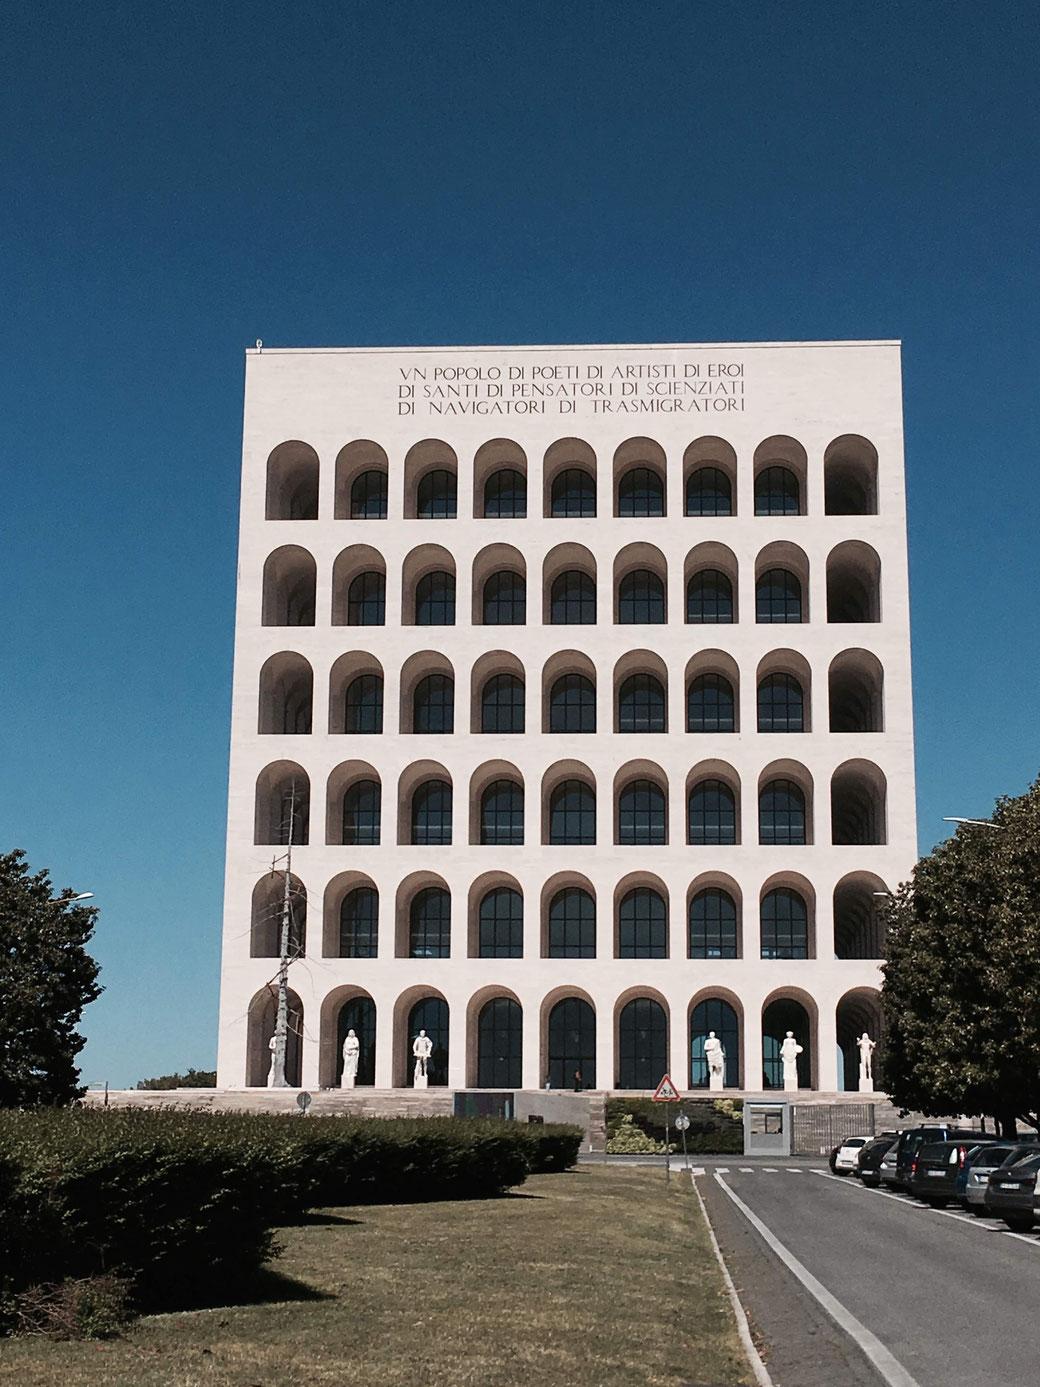 Das colosseo quadrato im Stadtviertel EUR